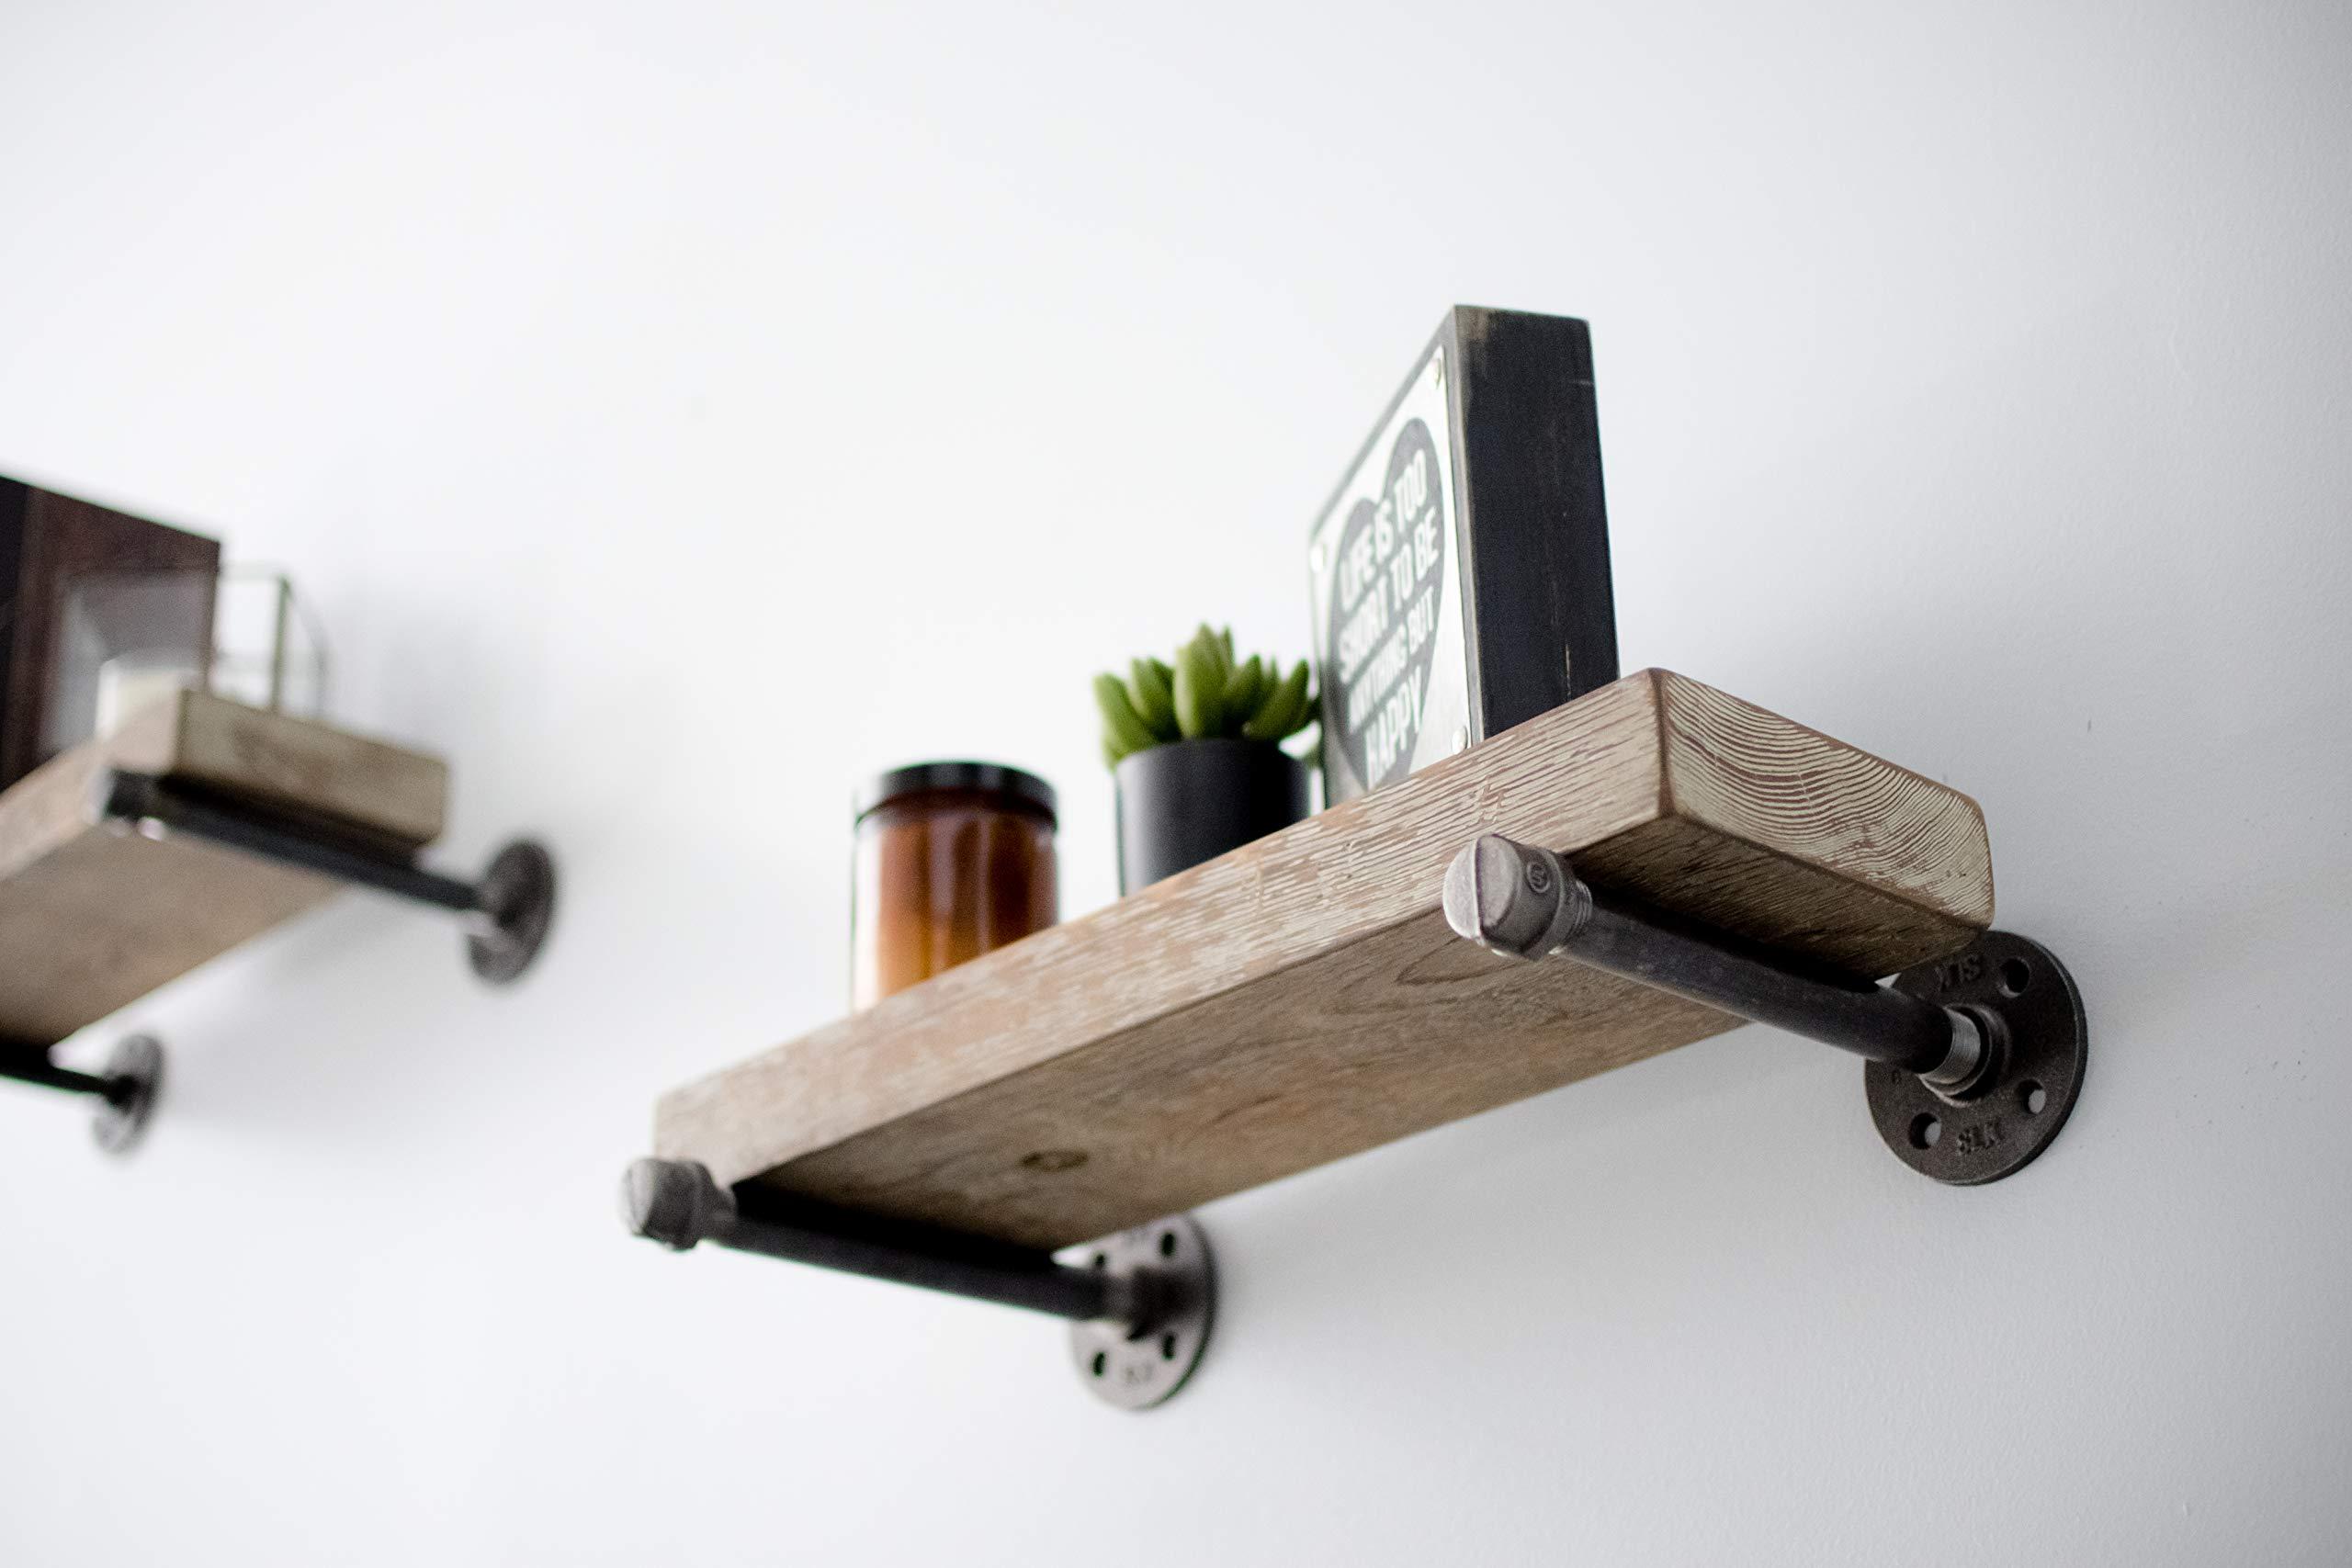 rustic pipe decor industrial shelf brackets set of four industrial steel 19442352189 ebay. Black Bedroom Furniture Sets. Home Design Ideas